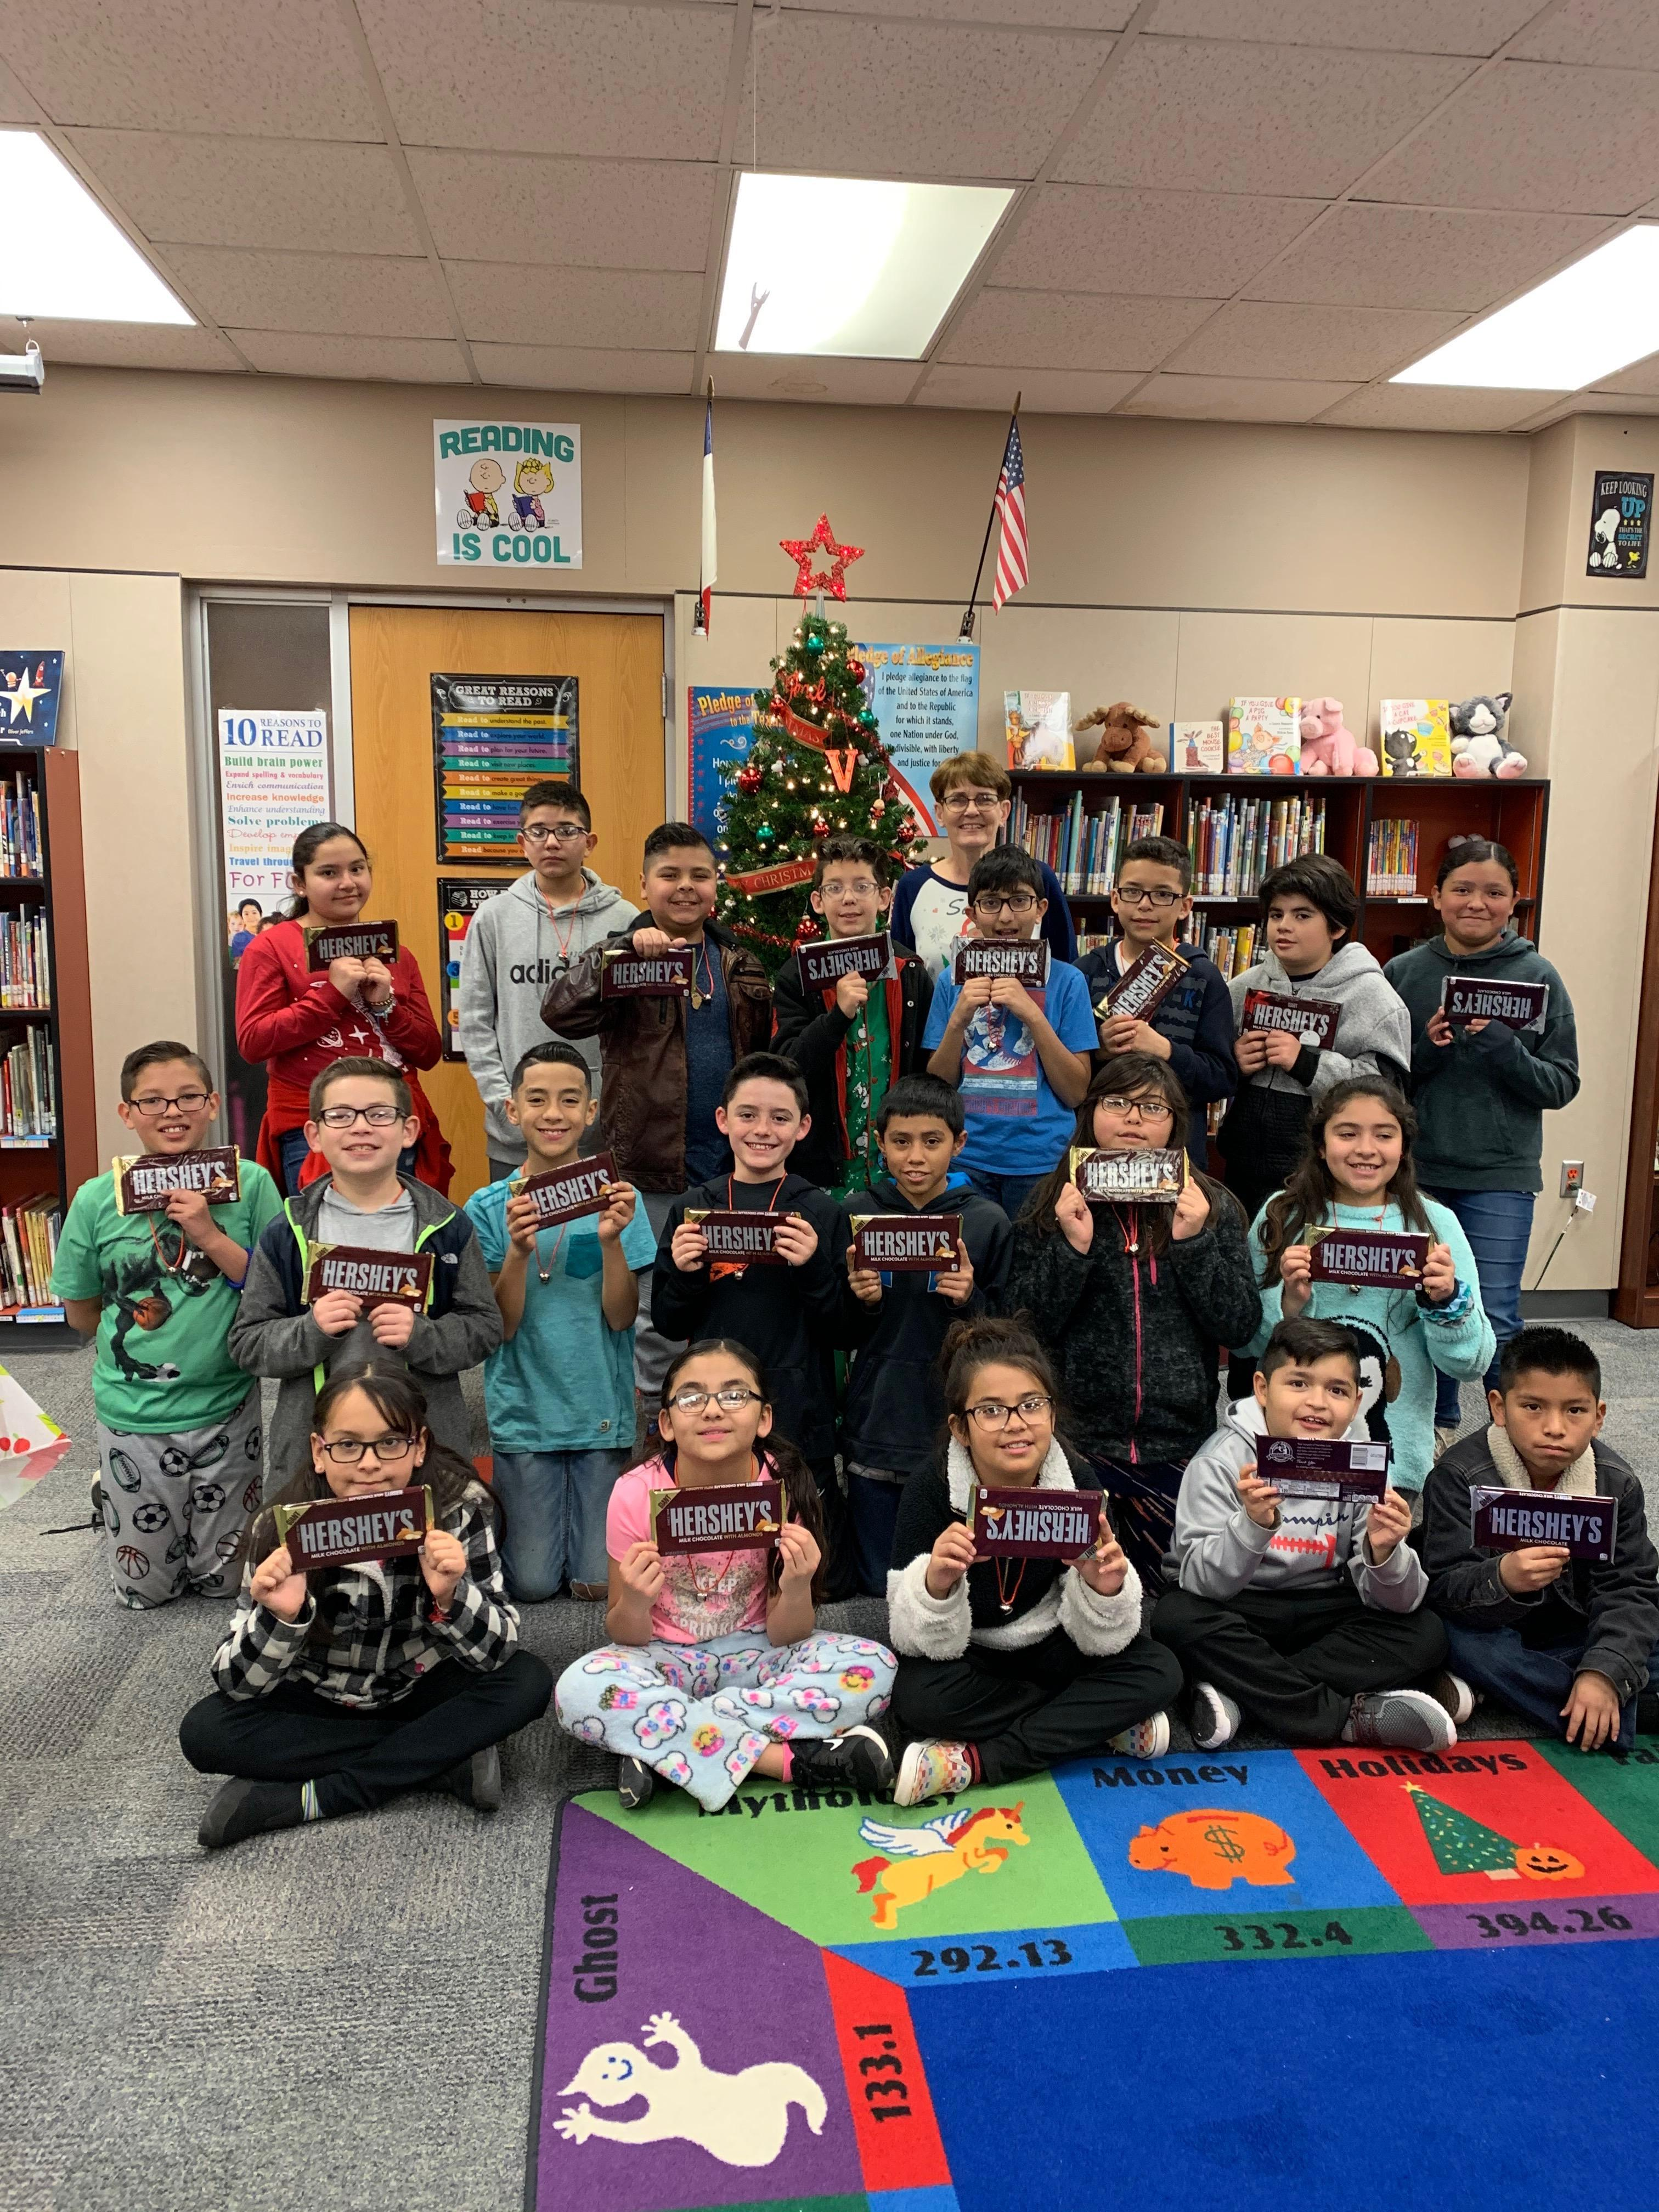 Ms. Goodin's Class. Most Words read Dec. 2 - 18, 2019.